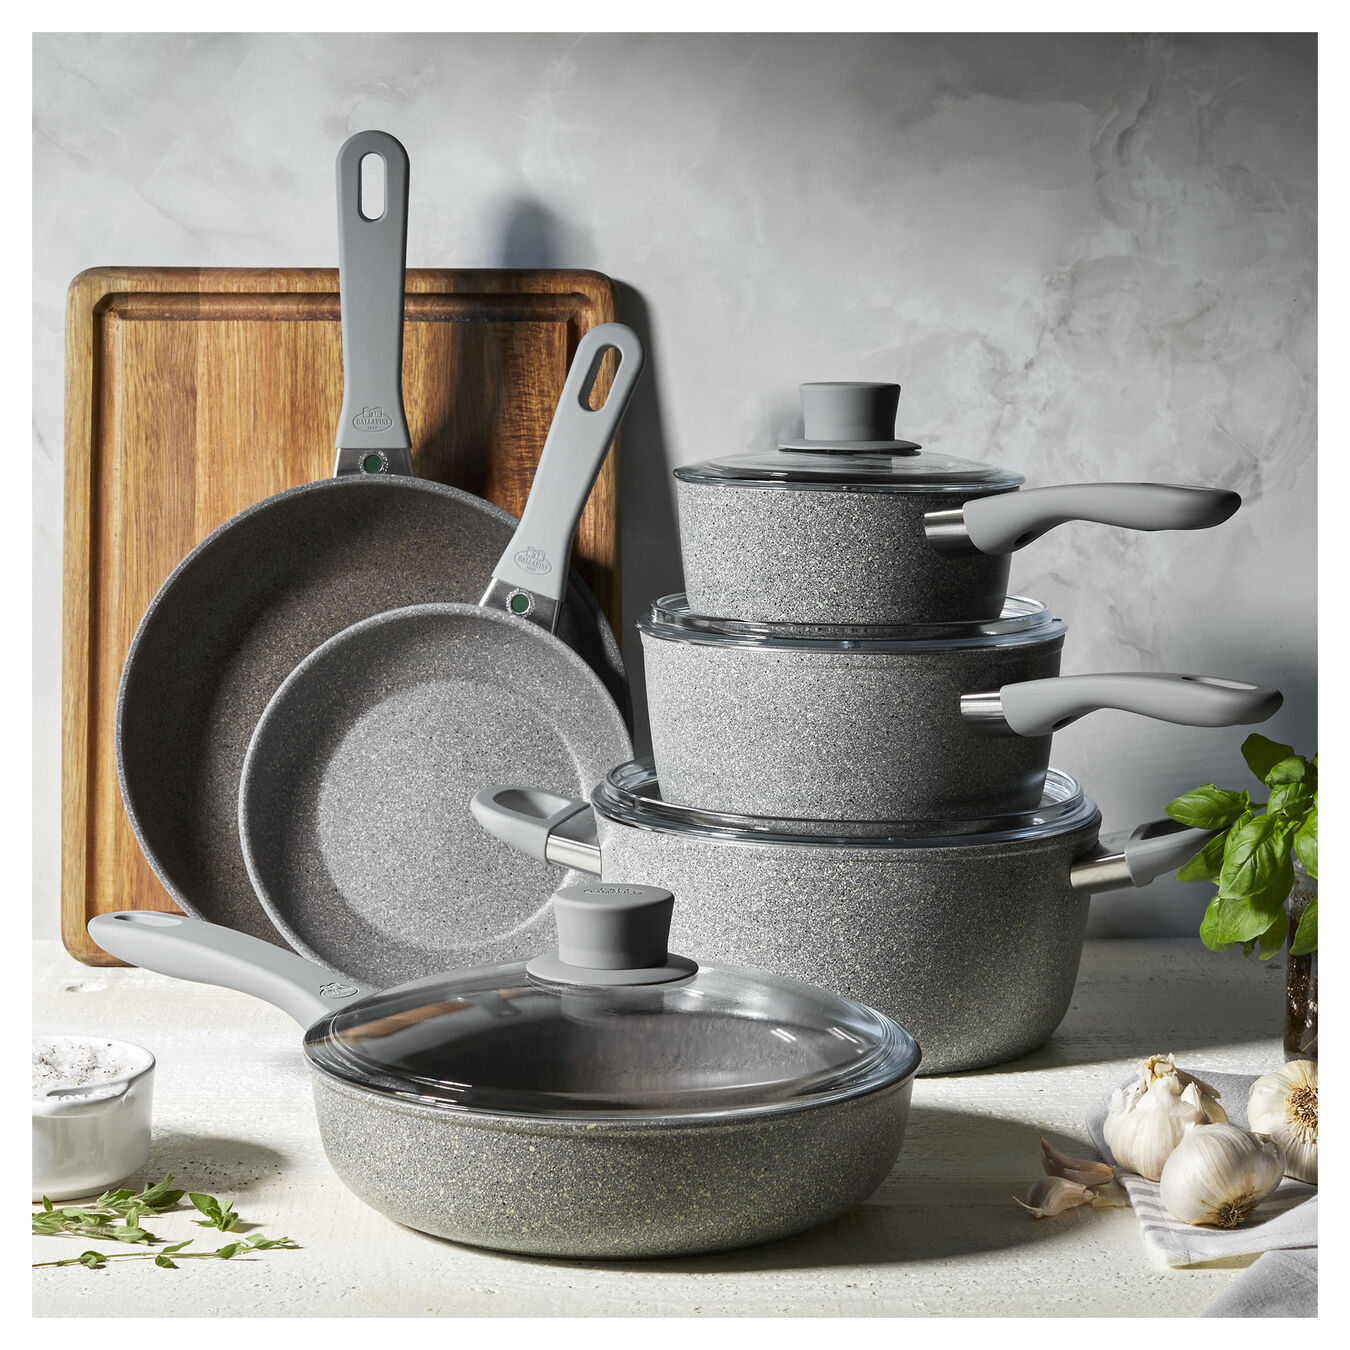 10-pc, Aluminum Nonstick Cookware Set,,large 9